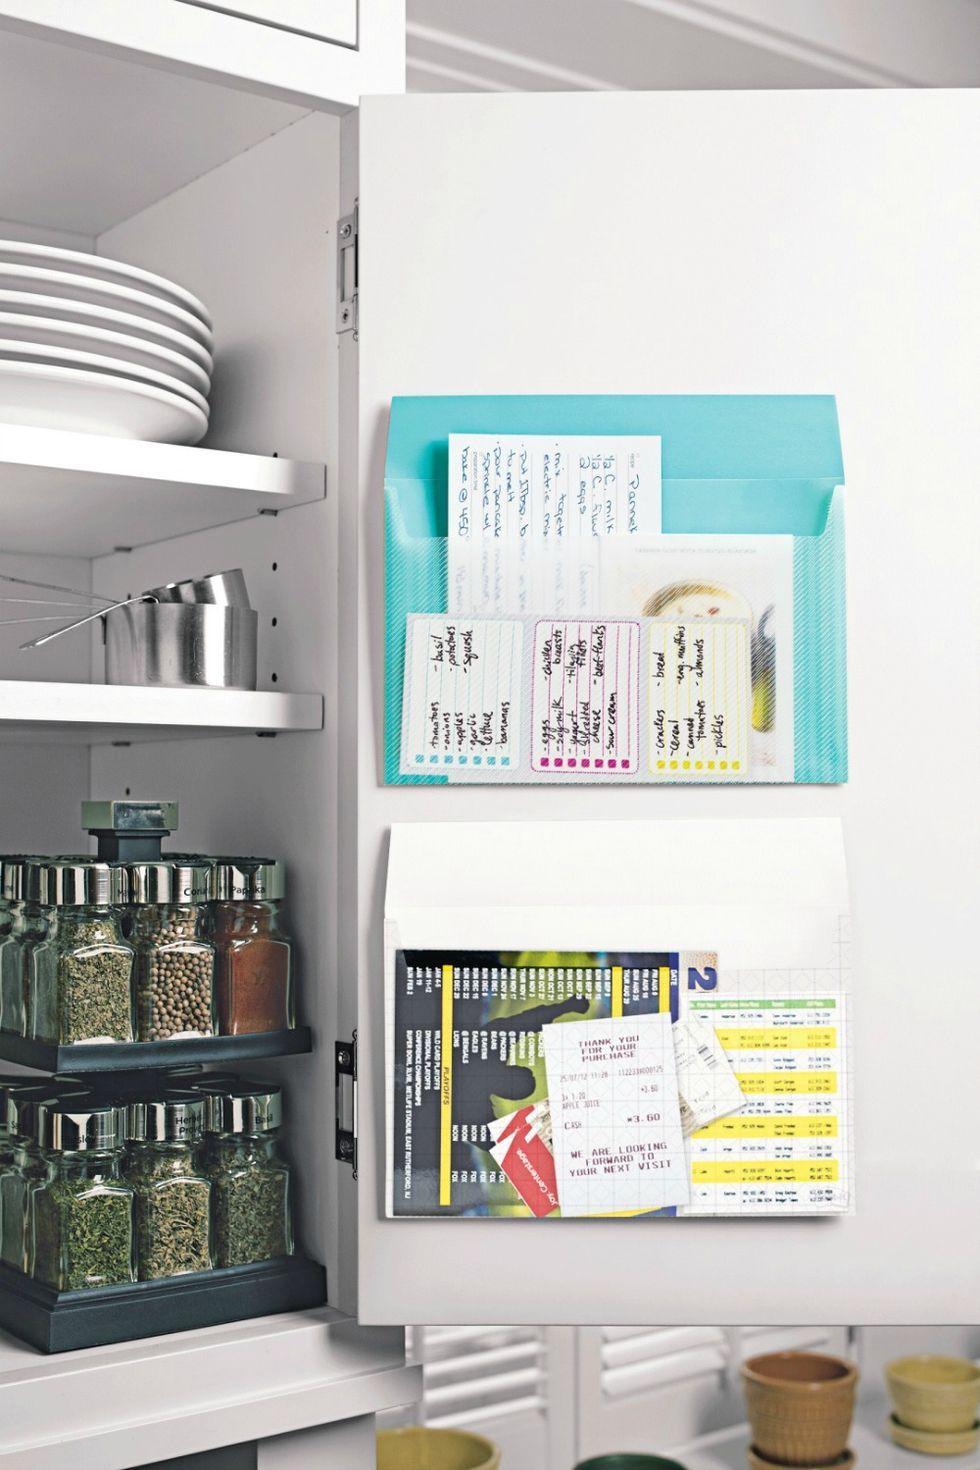 100 Best Organizing Tips Easy Home Organization Ideas